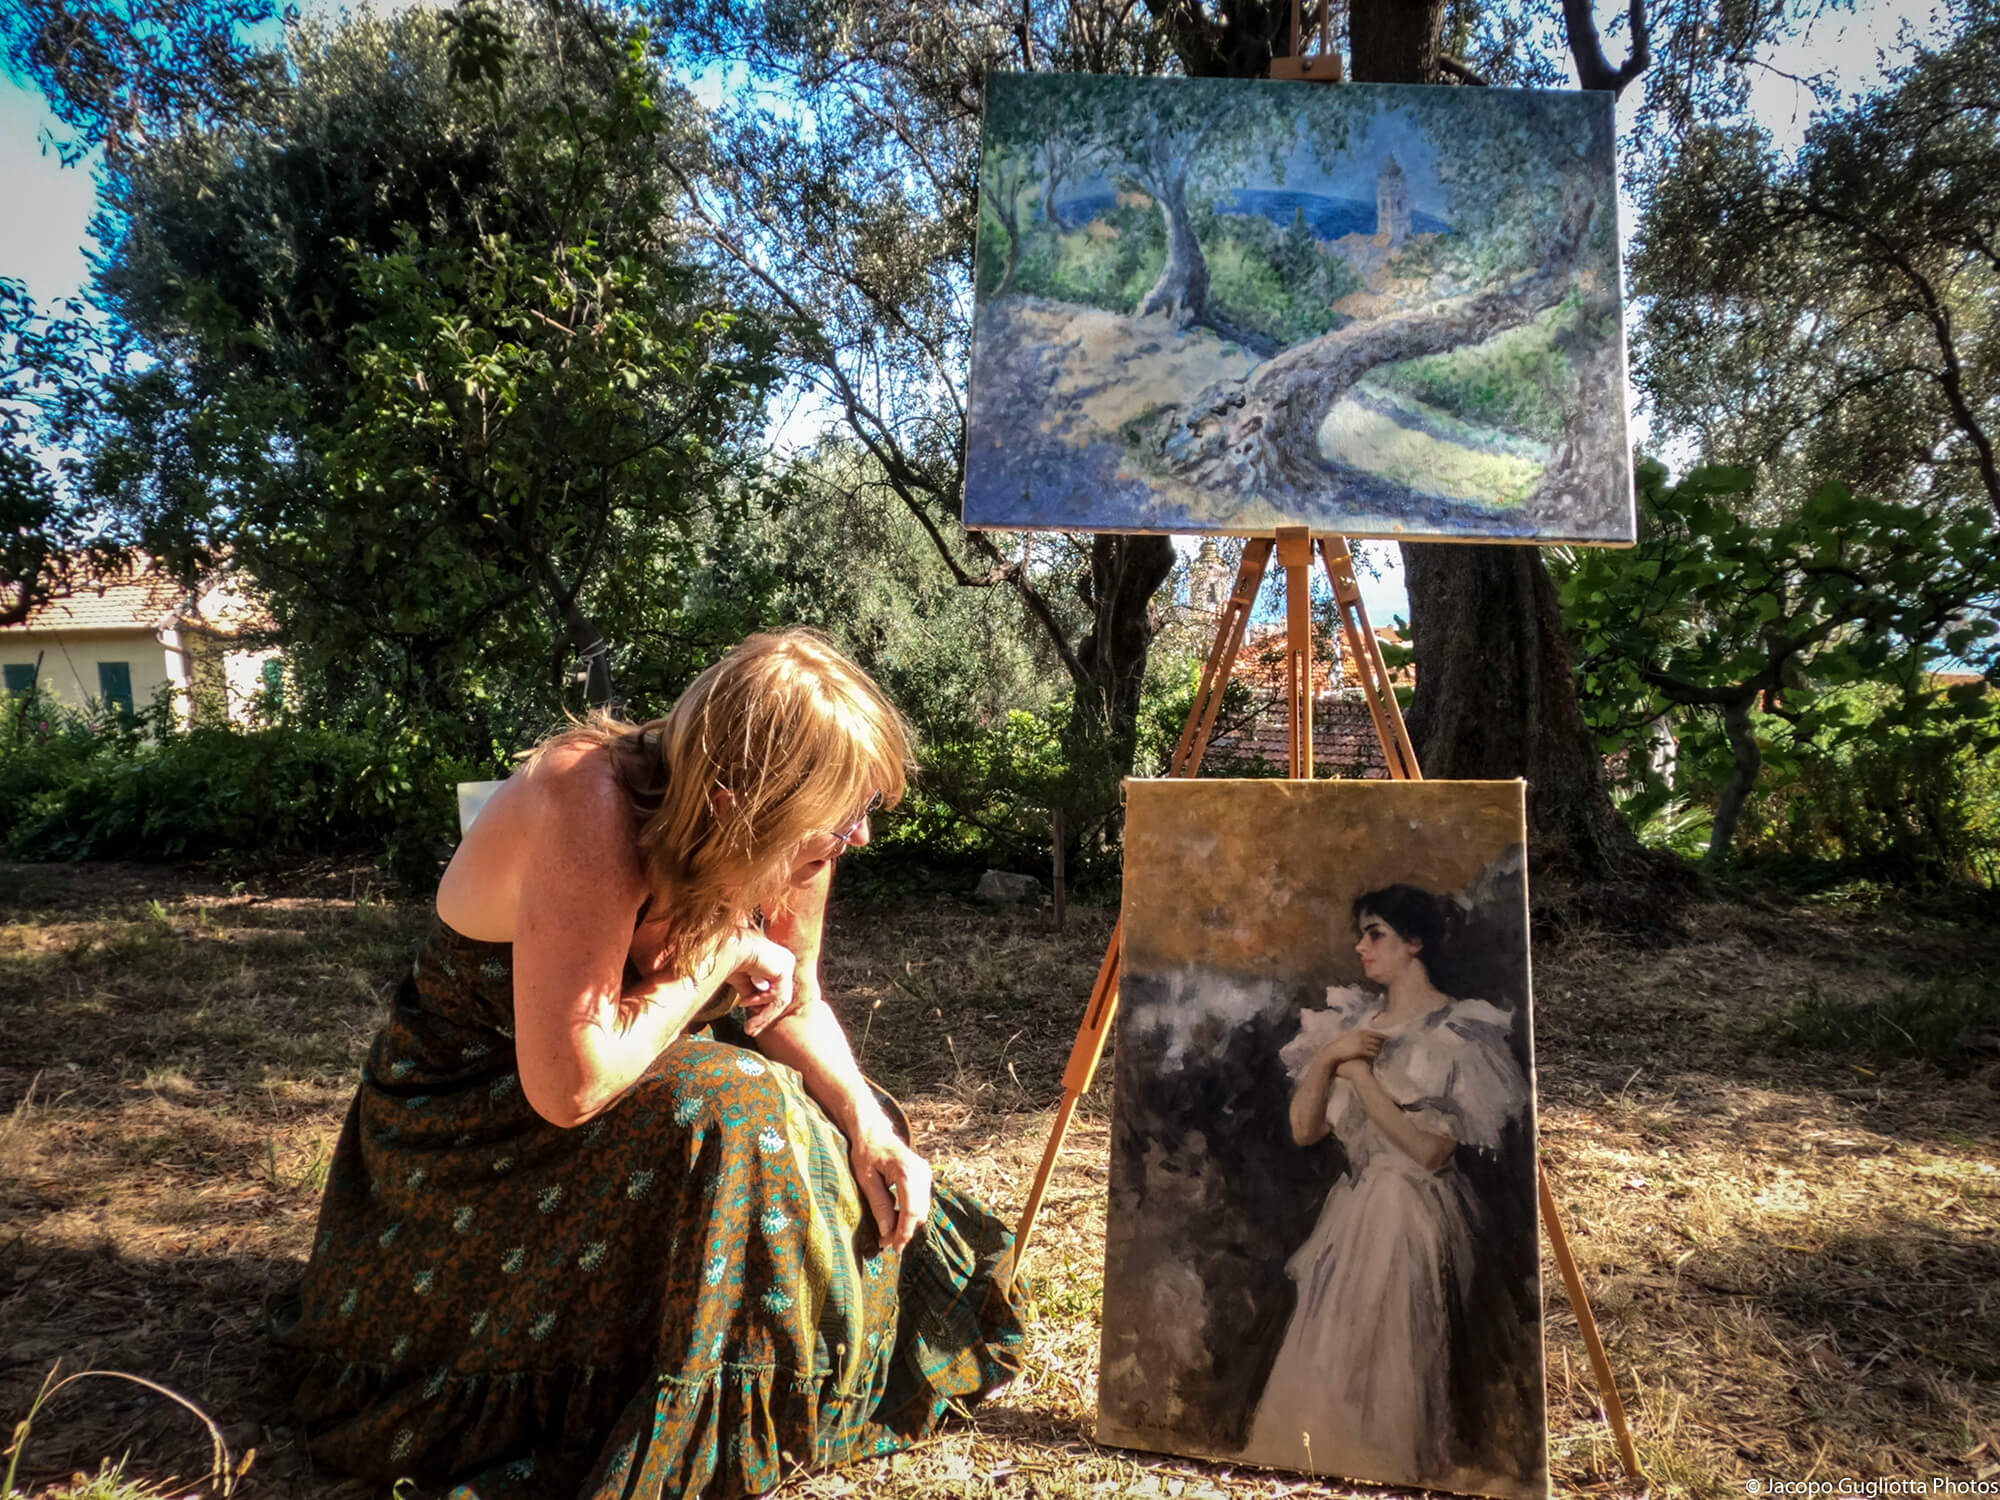 Una mostra sui passi di Monet